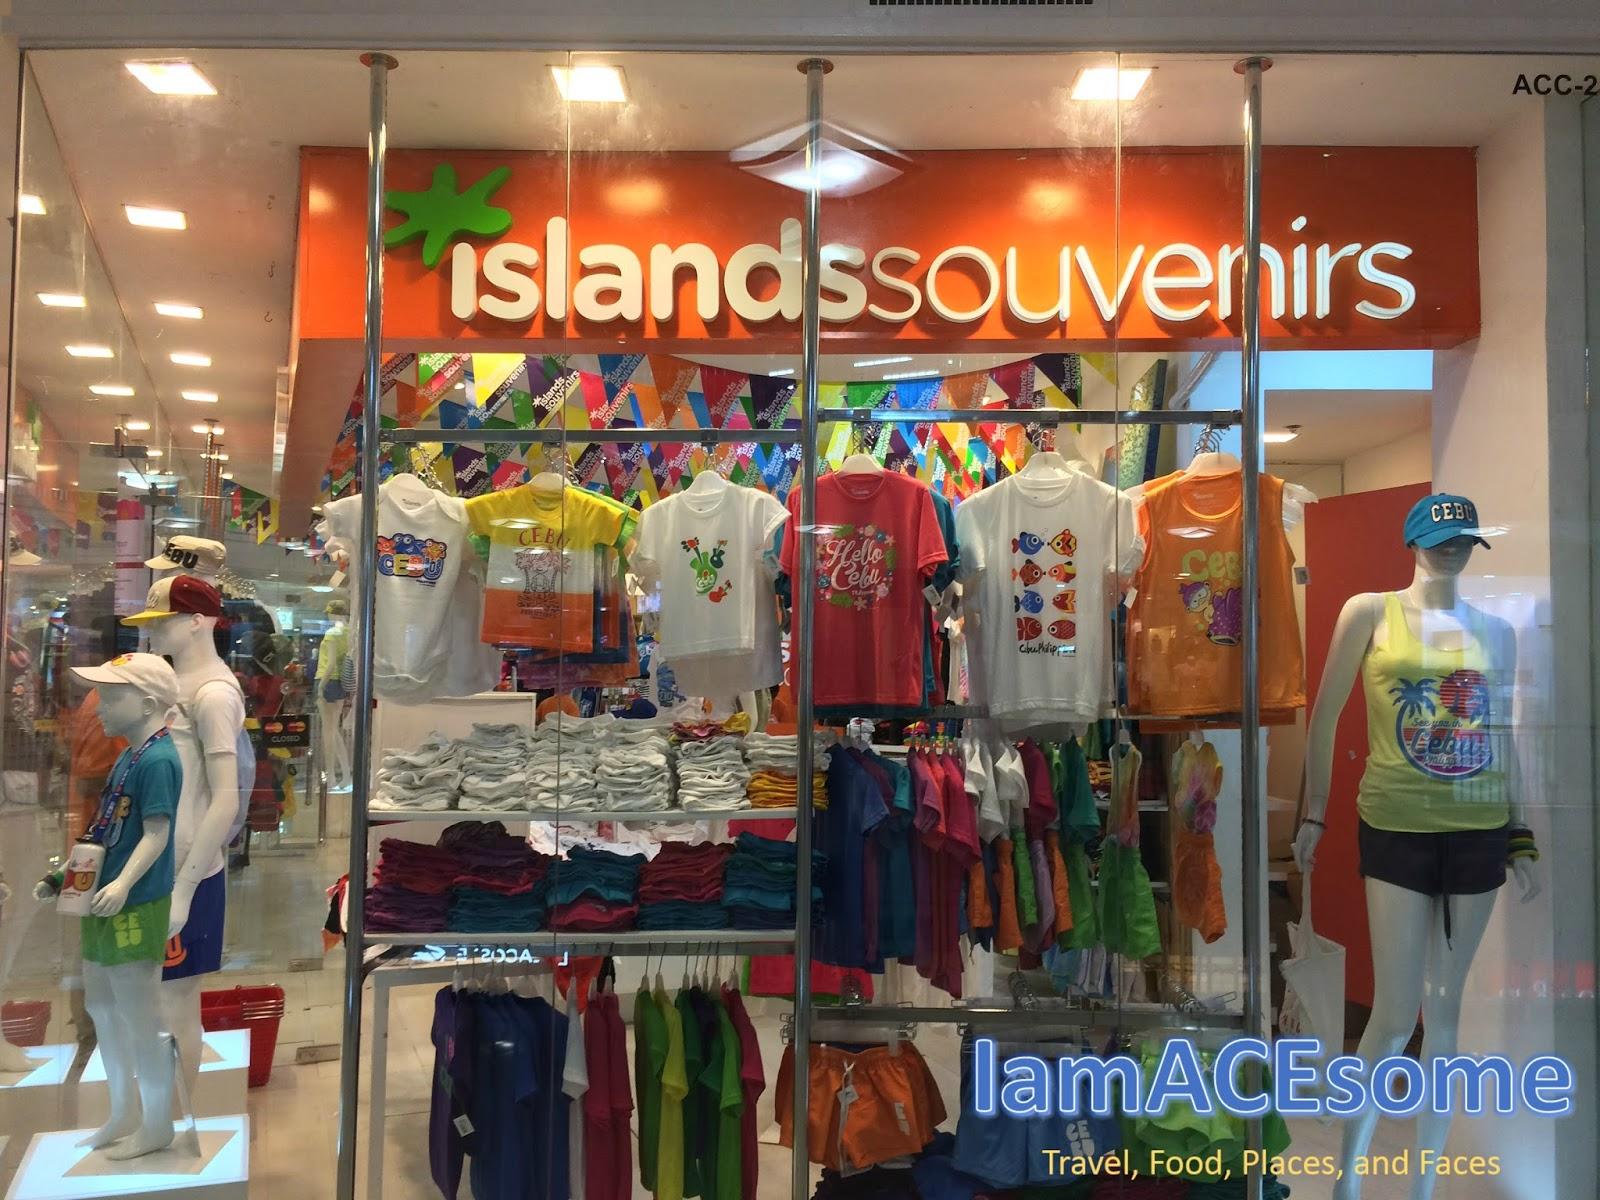 BEST BUY : Where to buy Pasalubong (present) in Cebu City